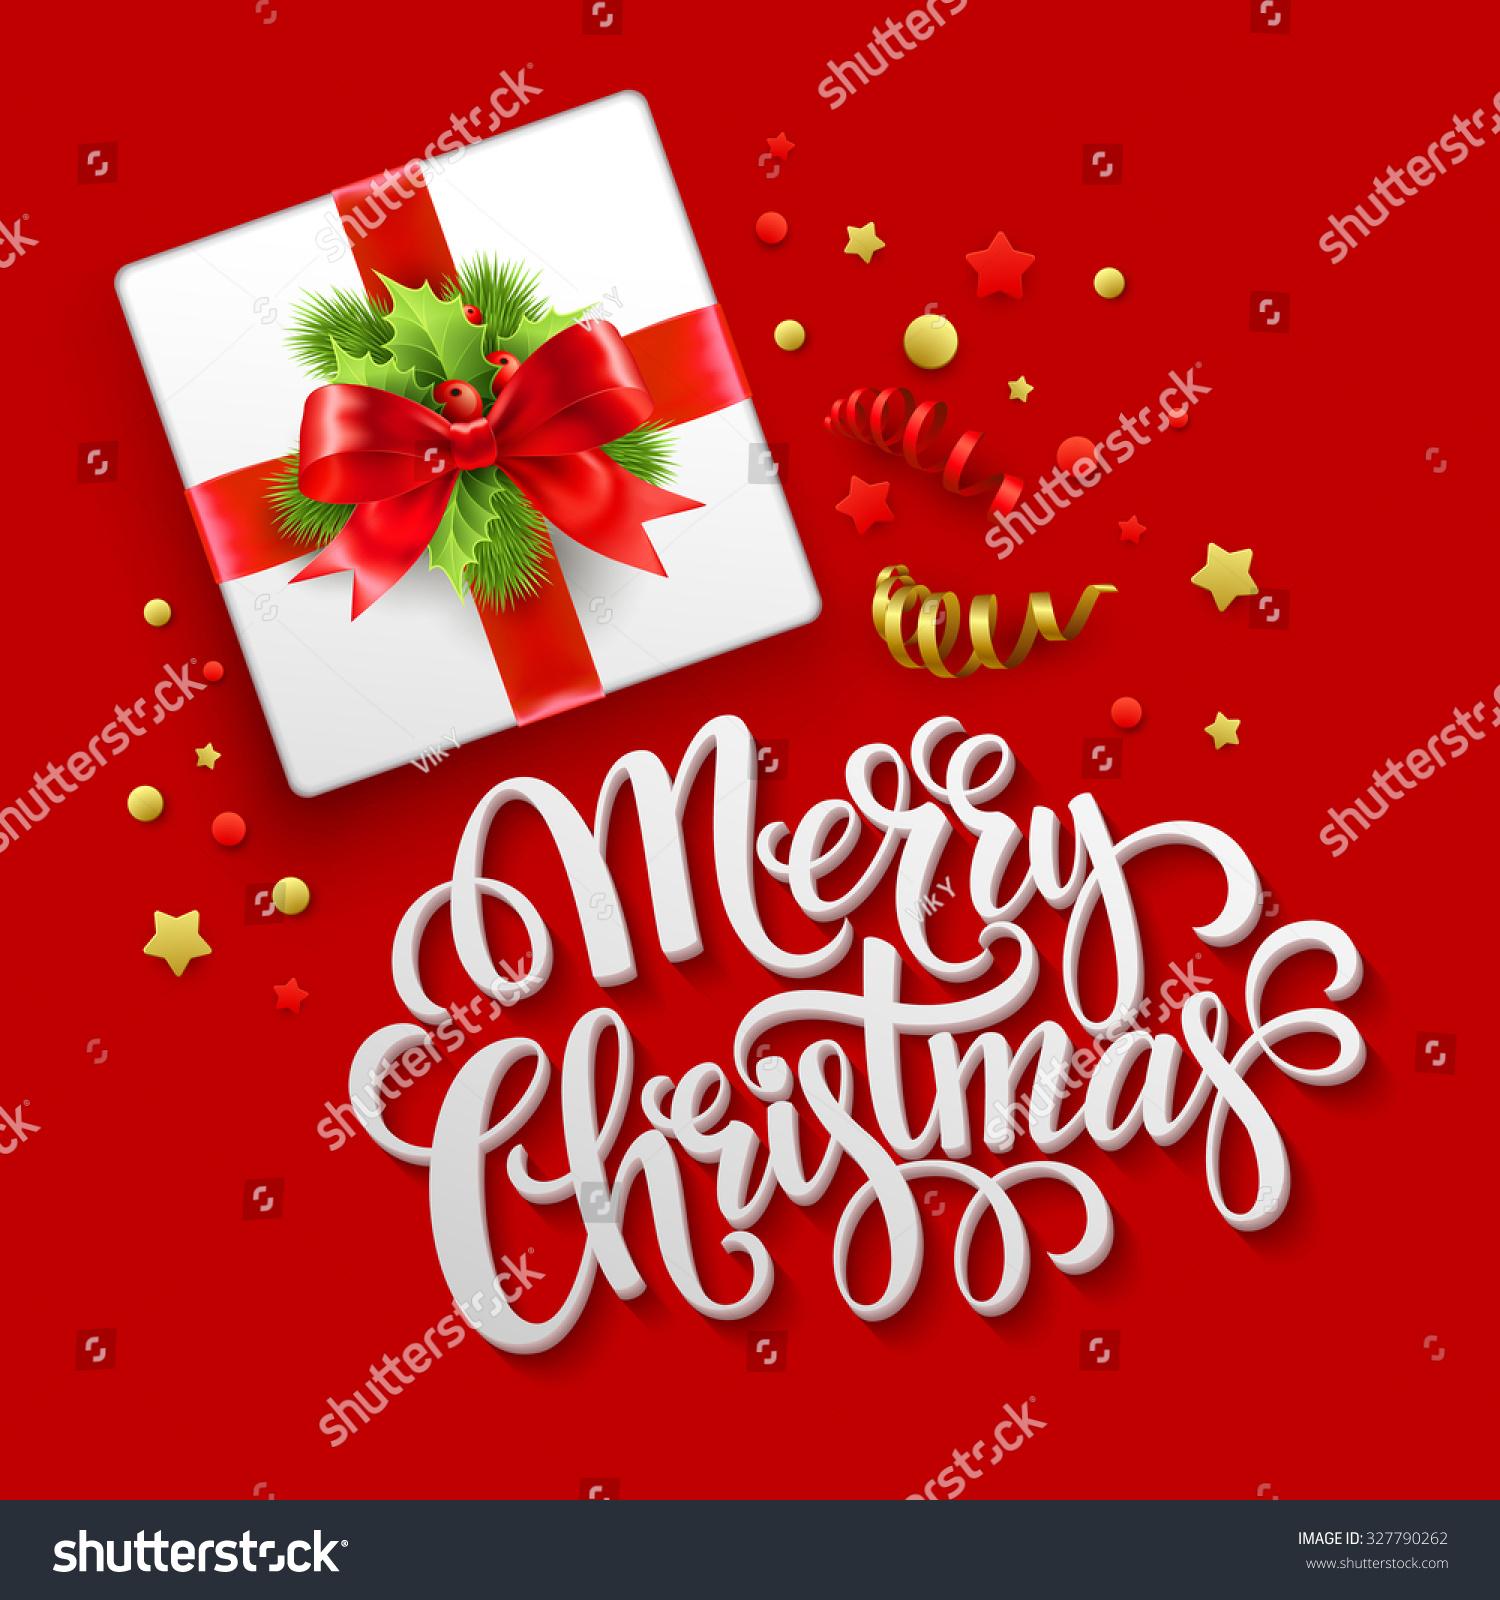 Merry christmas greeting card christmas gift stock vector merry christmas greeting card christmas gift box vector illustration eps 10 negle Image collections